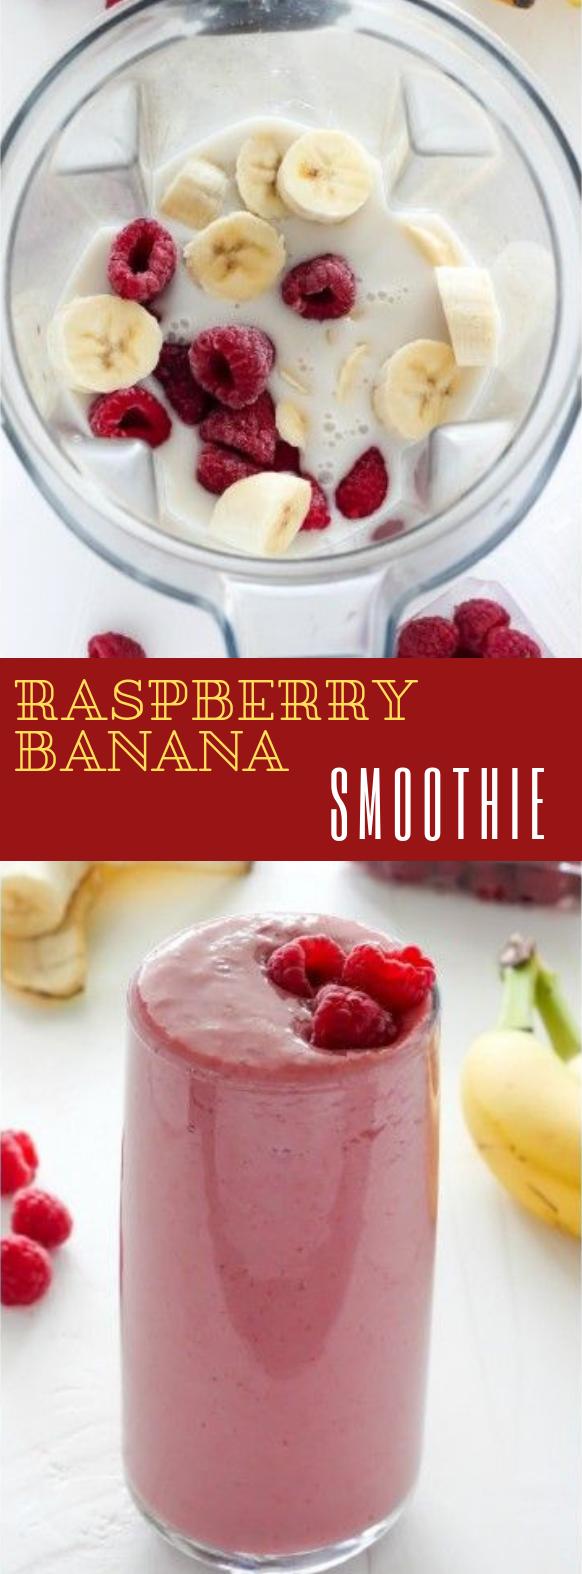 Raspberry Banana Smoothie #drink #smoothie